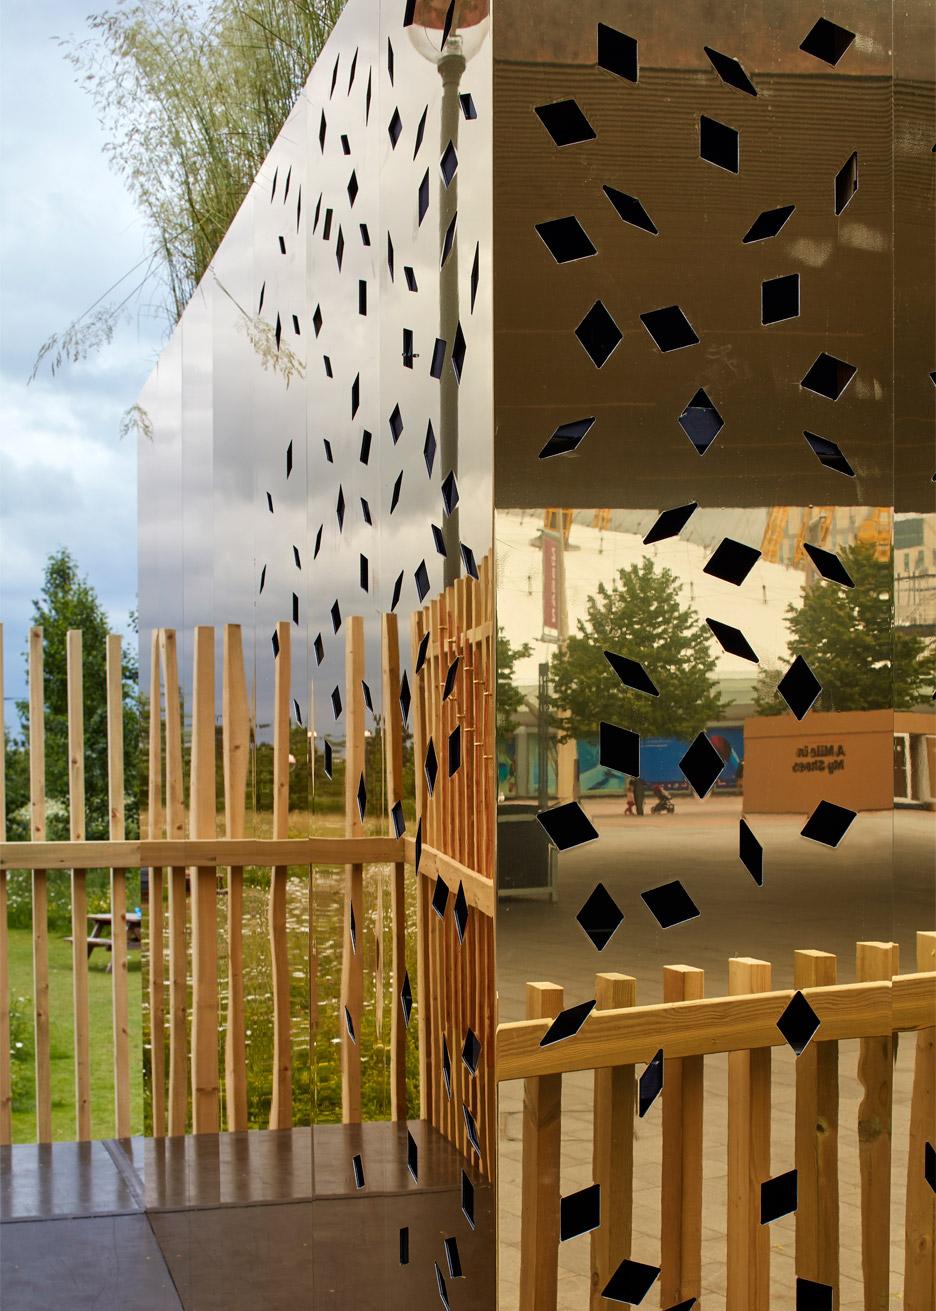 the-milkshake-tree-ph+-london-festival-architecture-2016-sensory-pavilion-cerebral-palsy-greenwich-london-uk-paul-raftery_dezeen_936_6